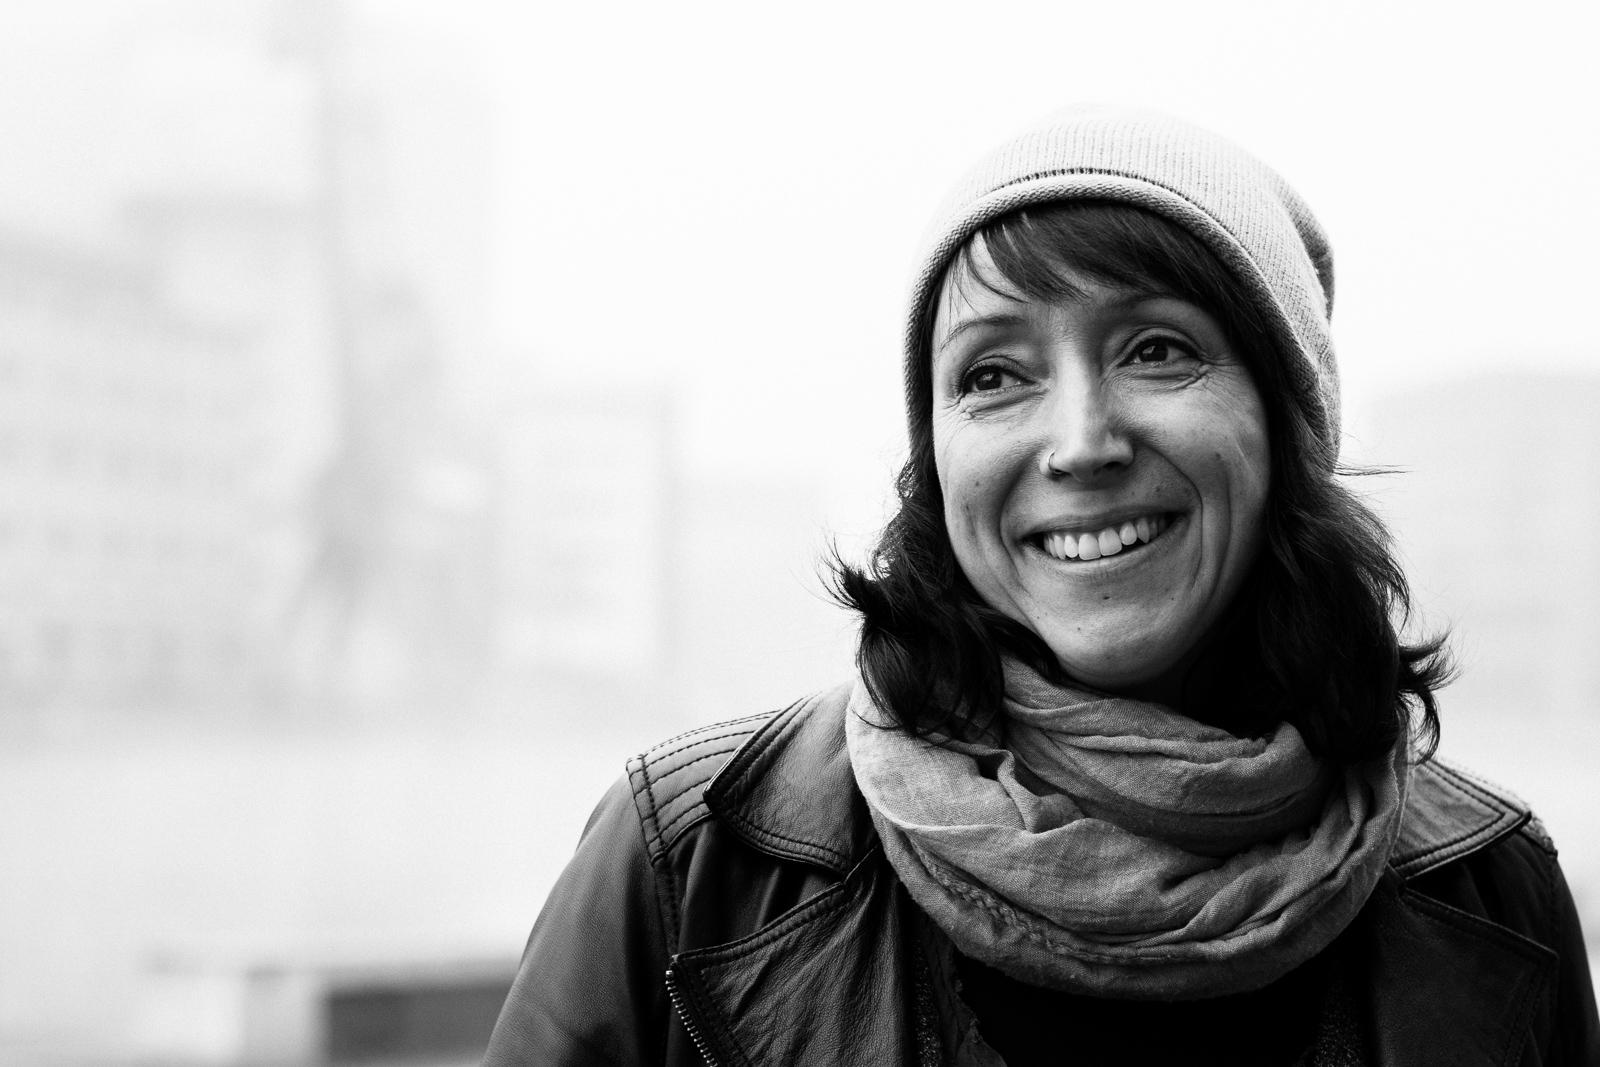 Fotoshooting Isabel Siekmann - Businessportraits Businessfotos Unternehmensfotos Geschäftsfotos